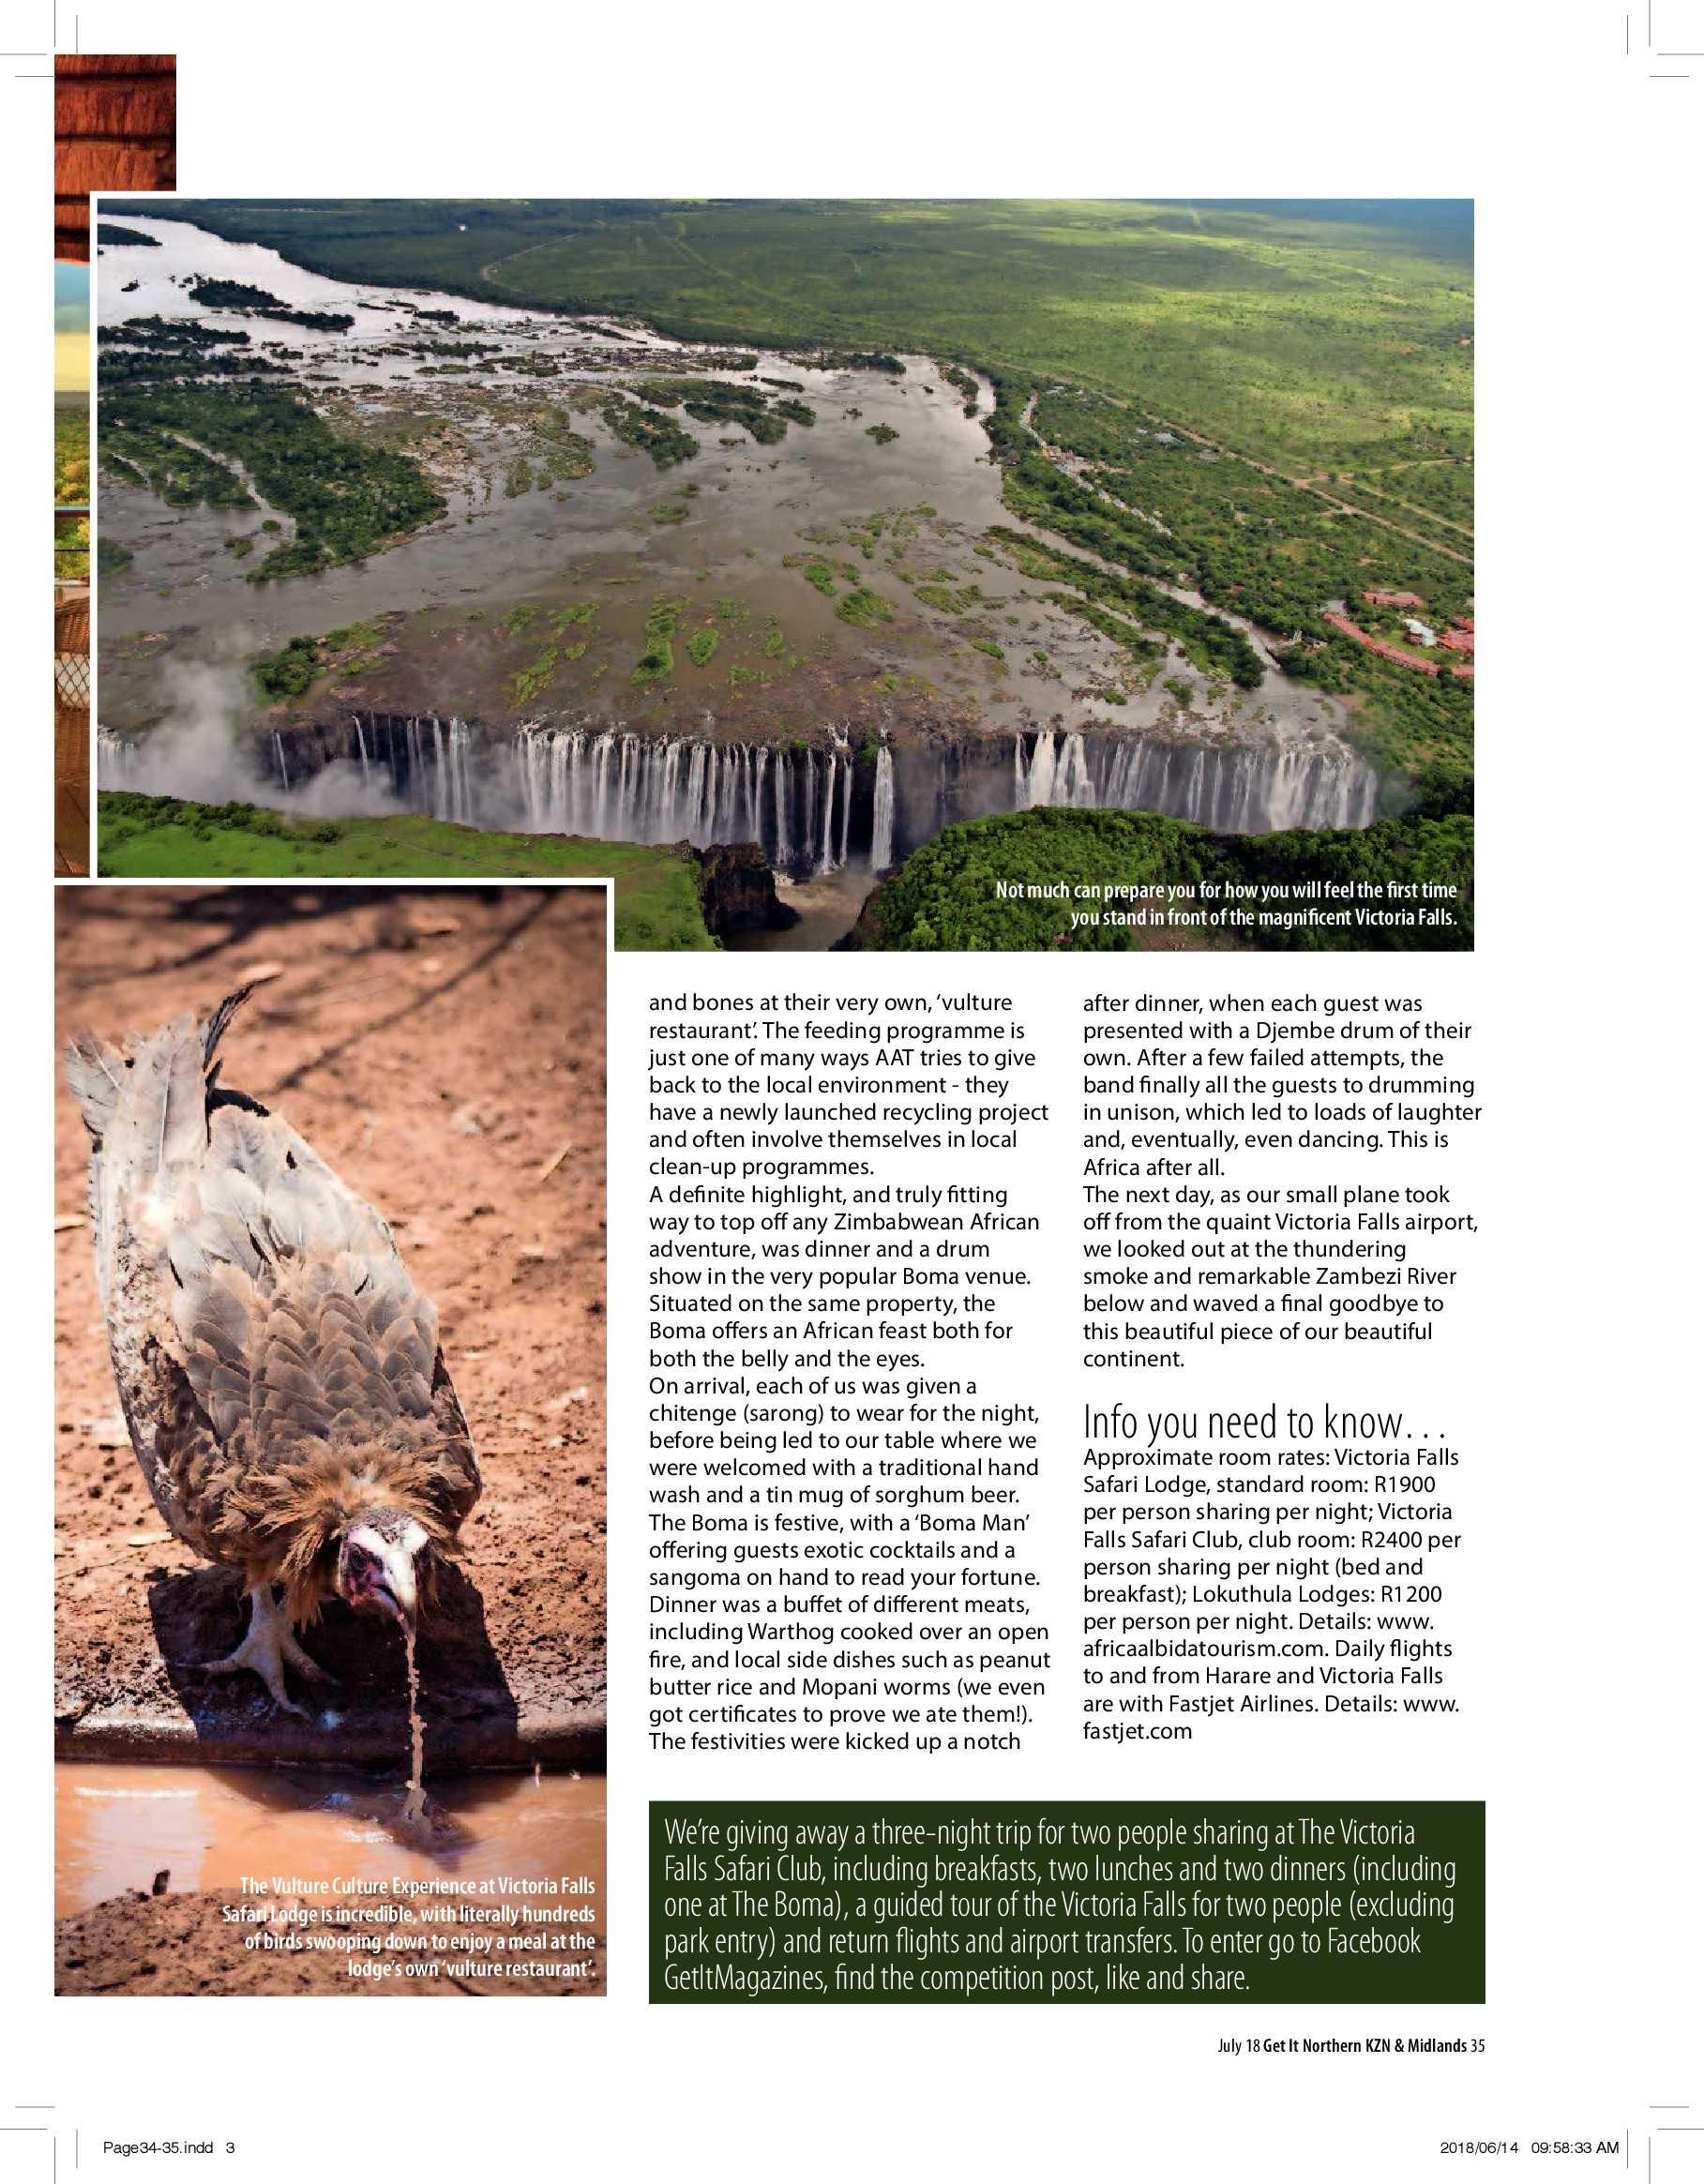 northern-kzn-midlands-get-july-2018-epapers-page-37